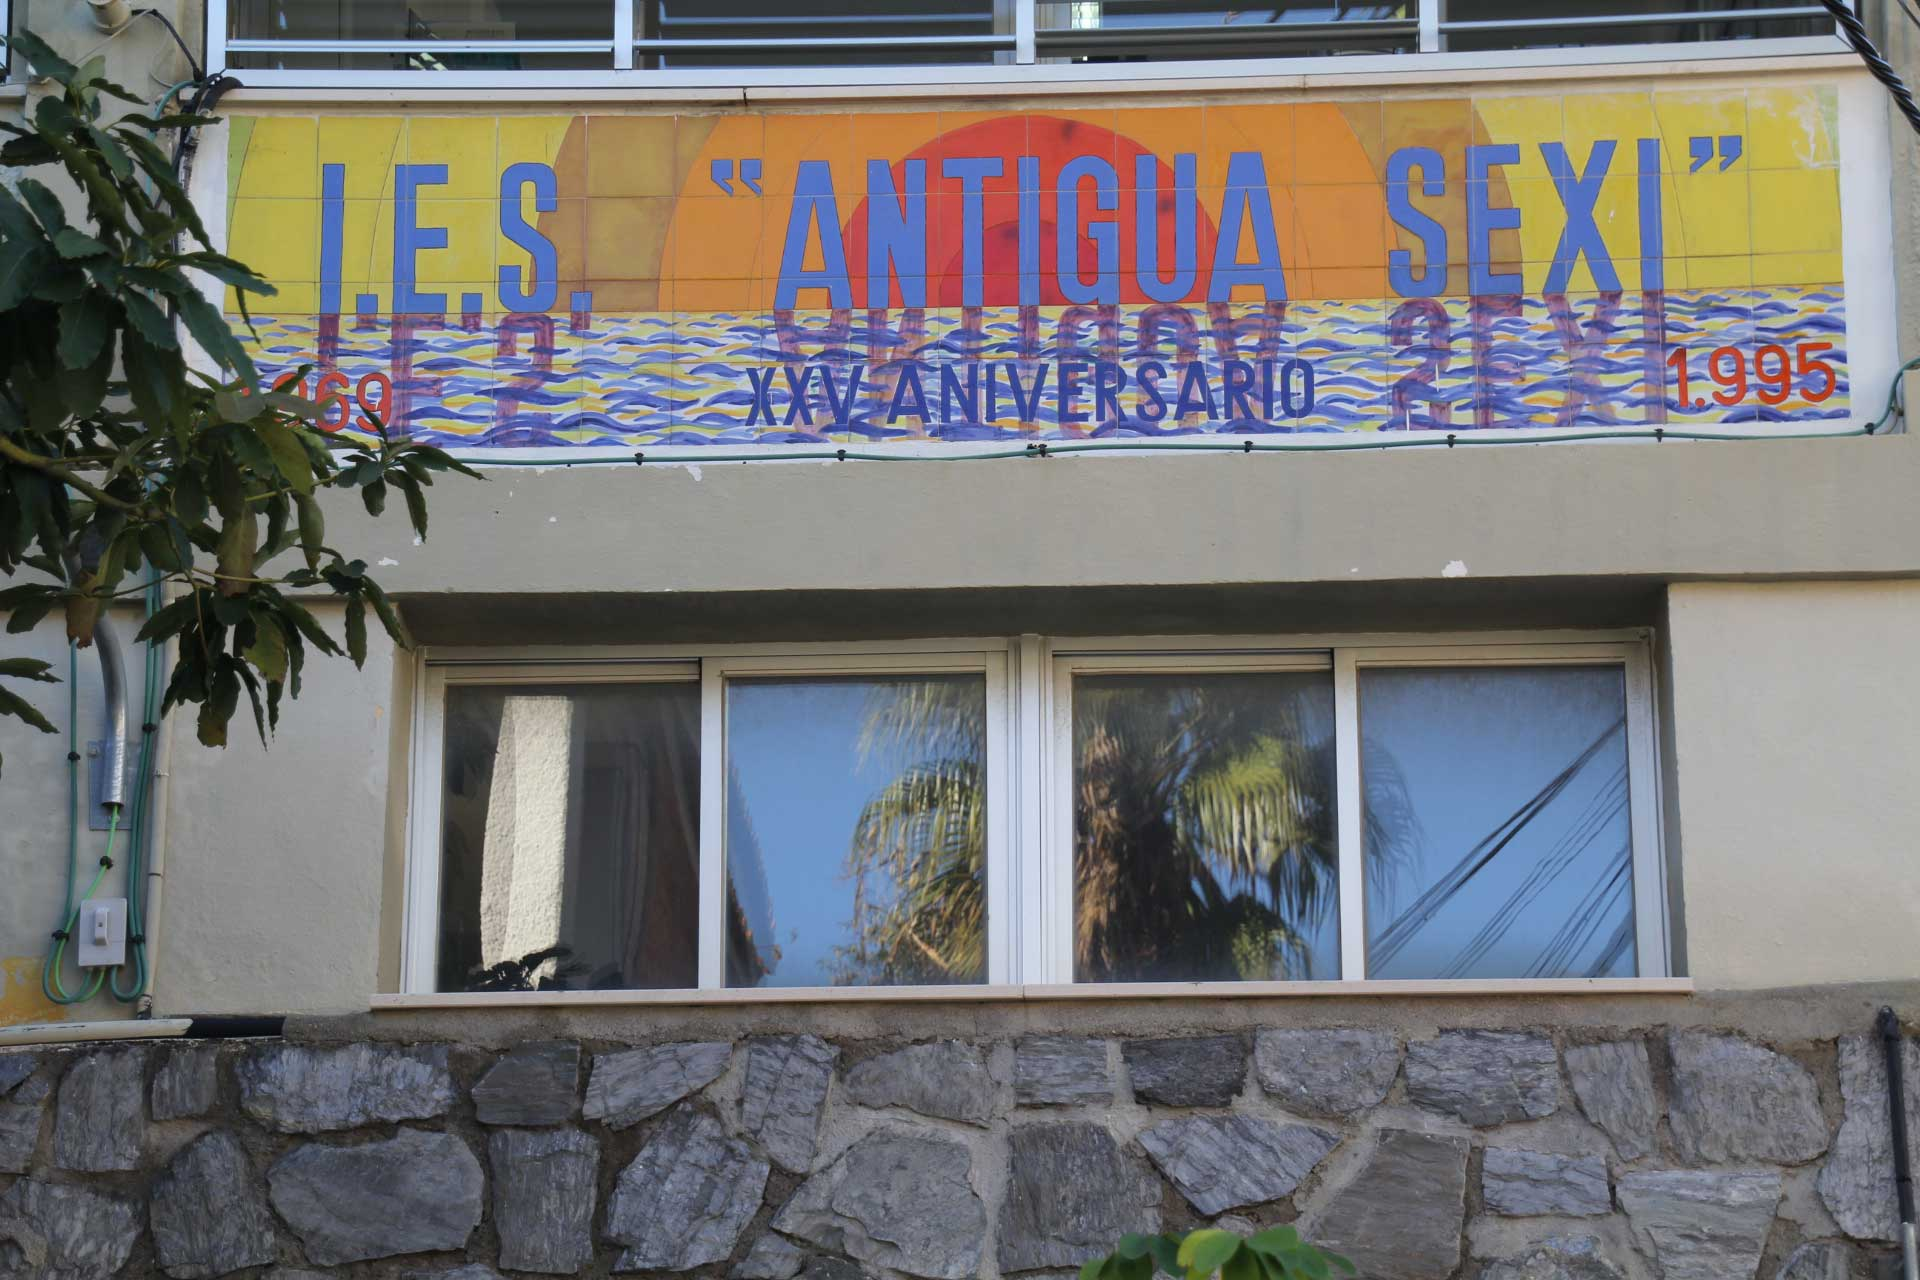 IES-ANTIGA-SEXI-ALMUÑECAR-